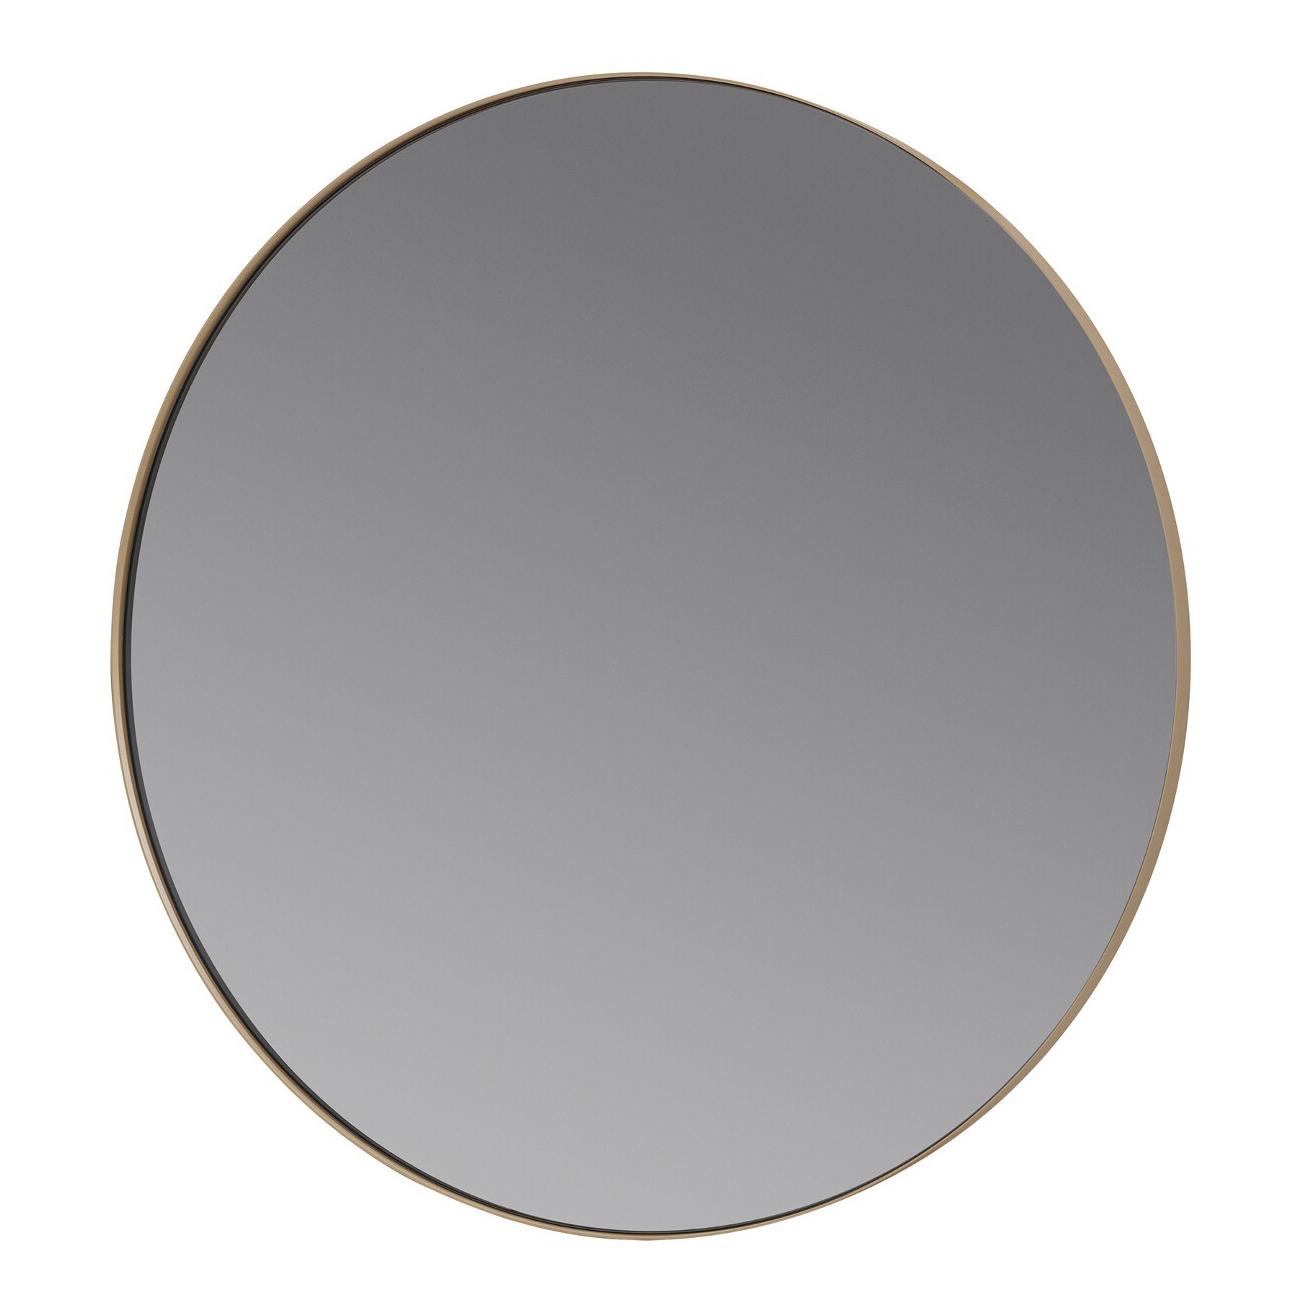 Okrúhle zrkadlo RIM svetlohnedé Blomus